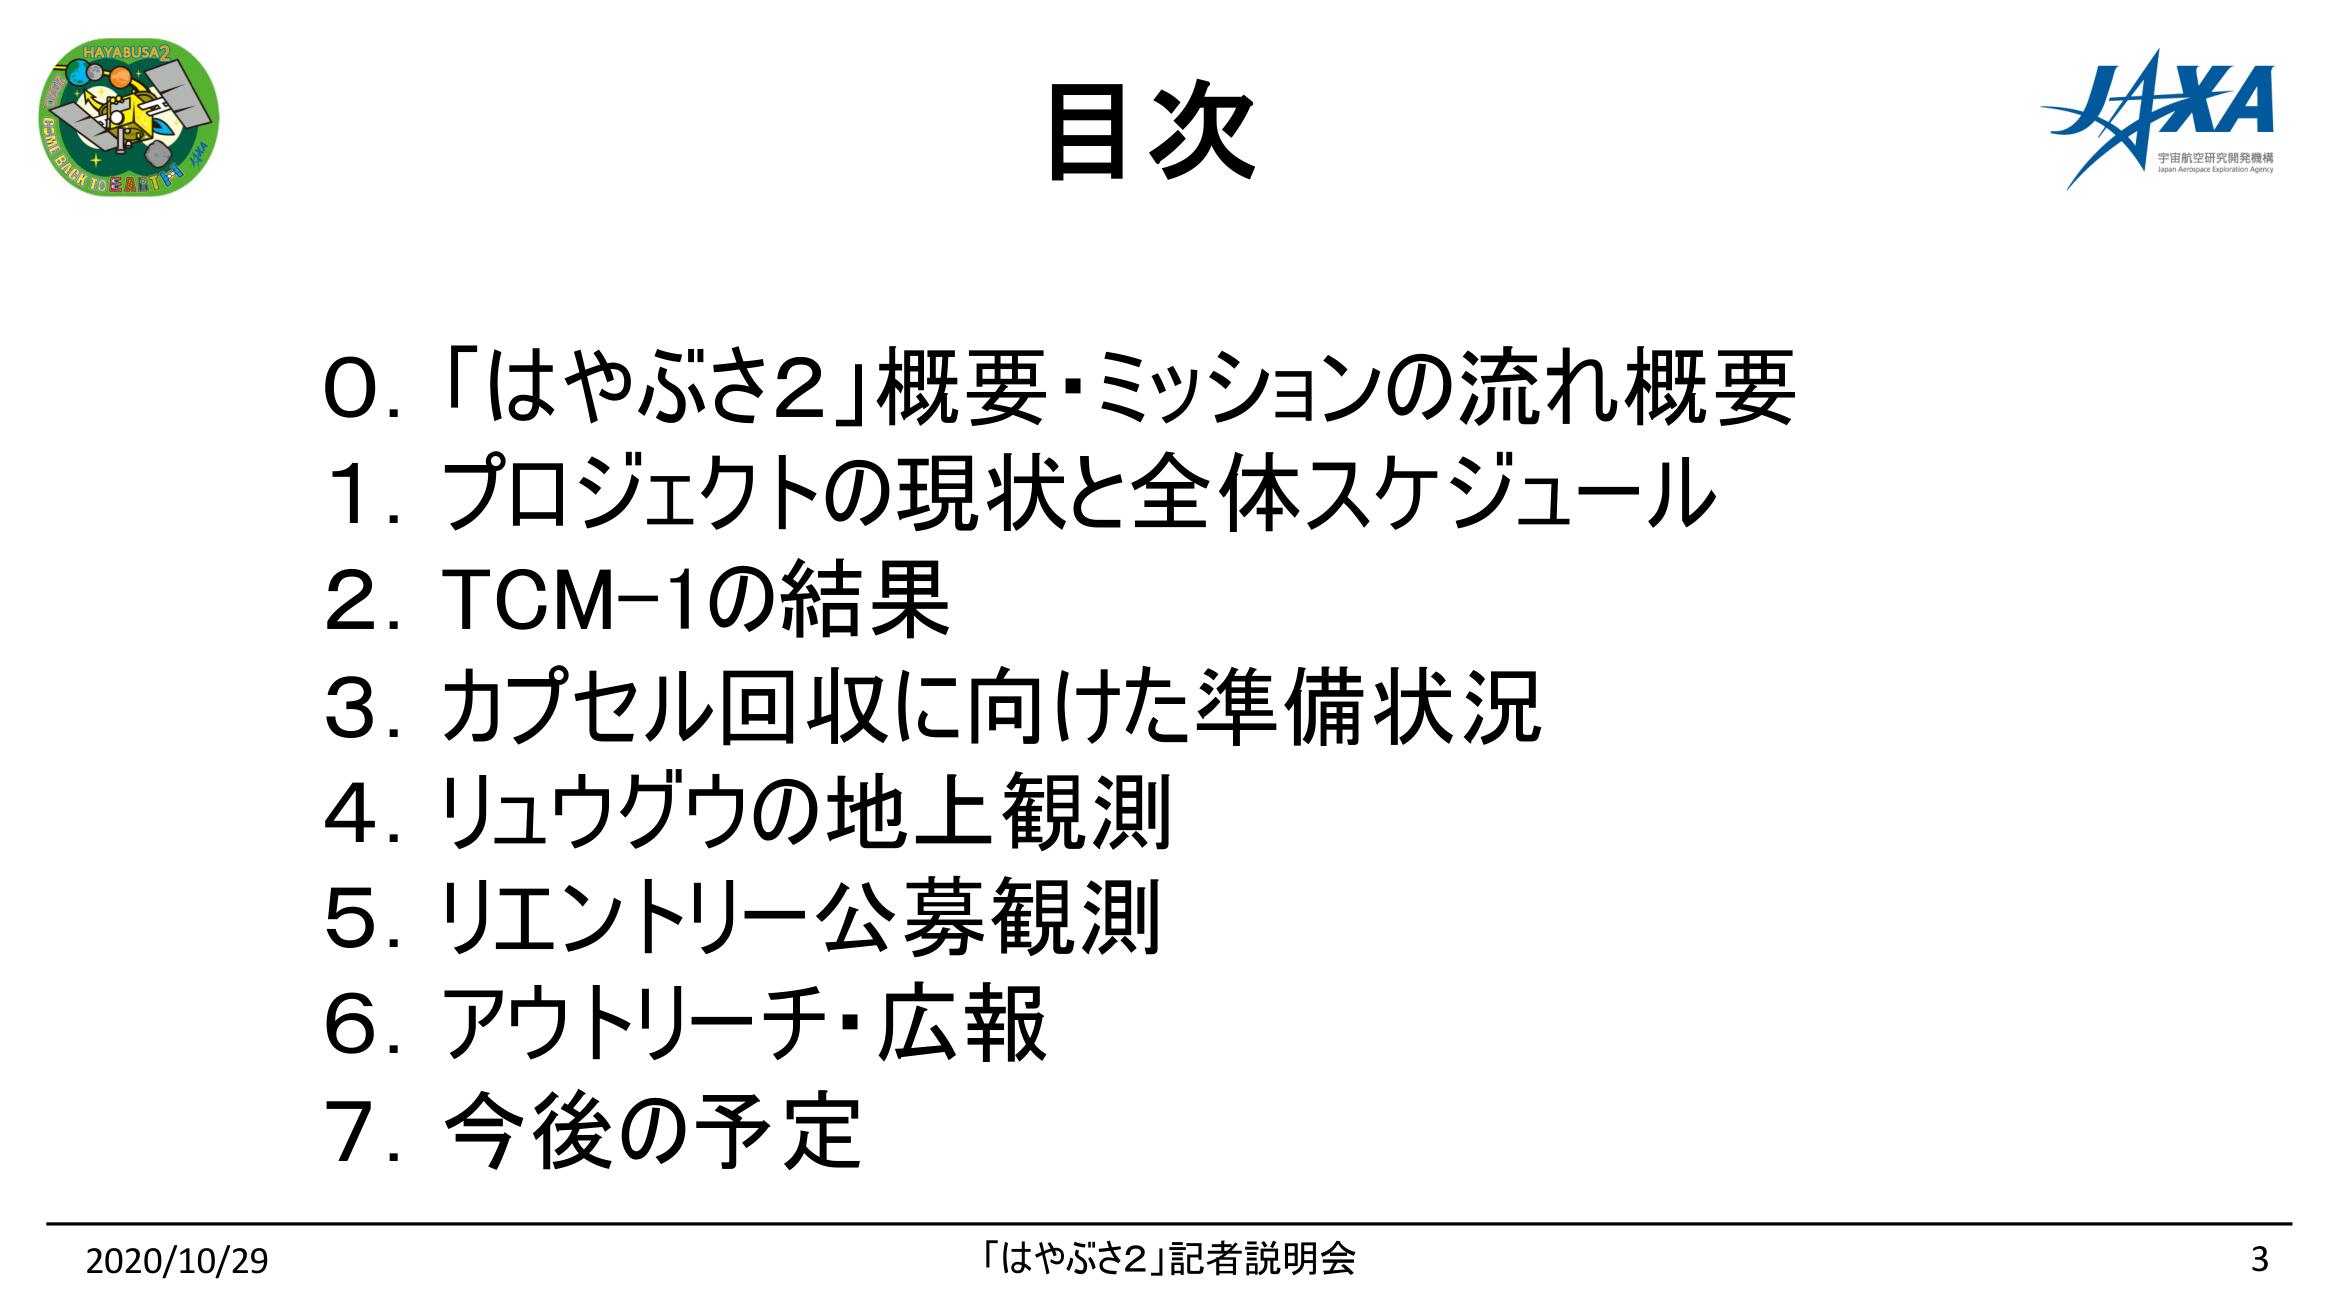 f:id:Imamura:20201029161211p:plain